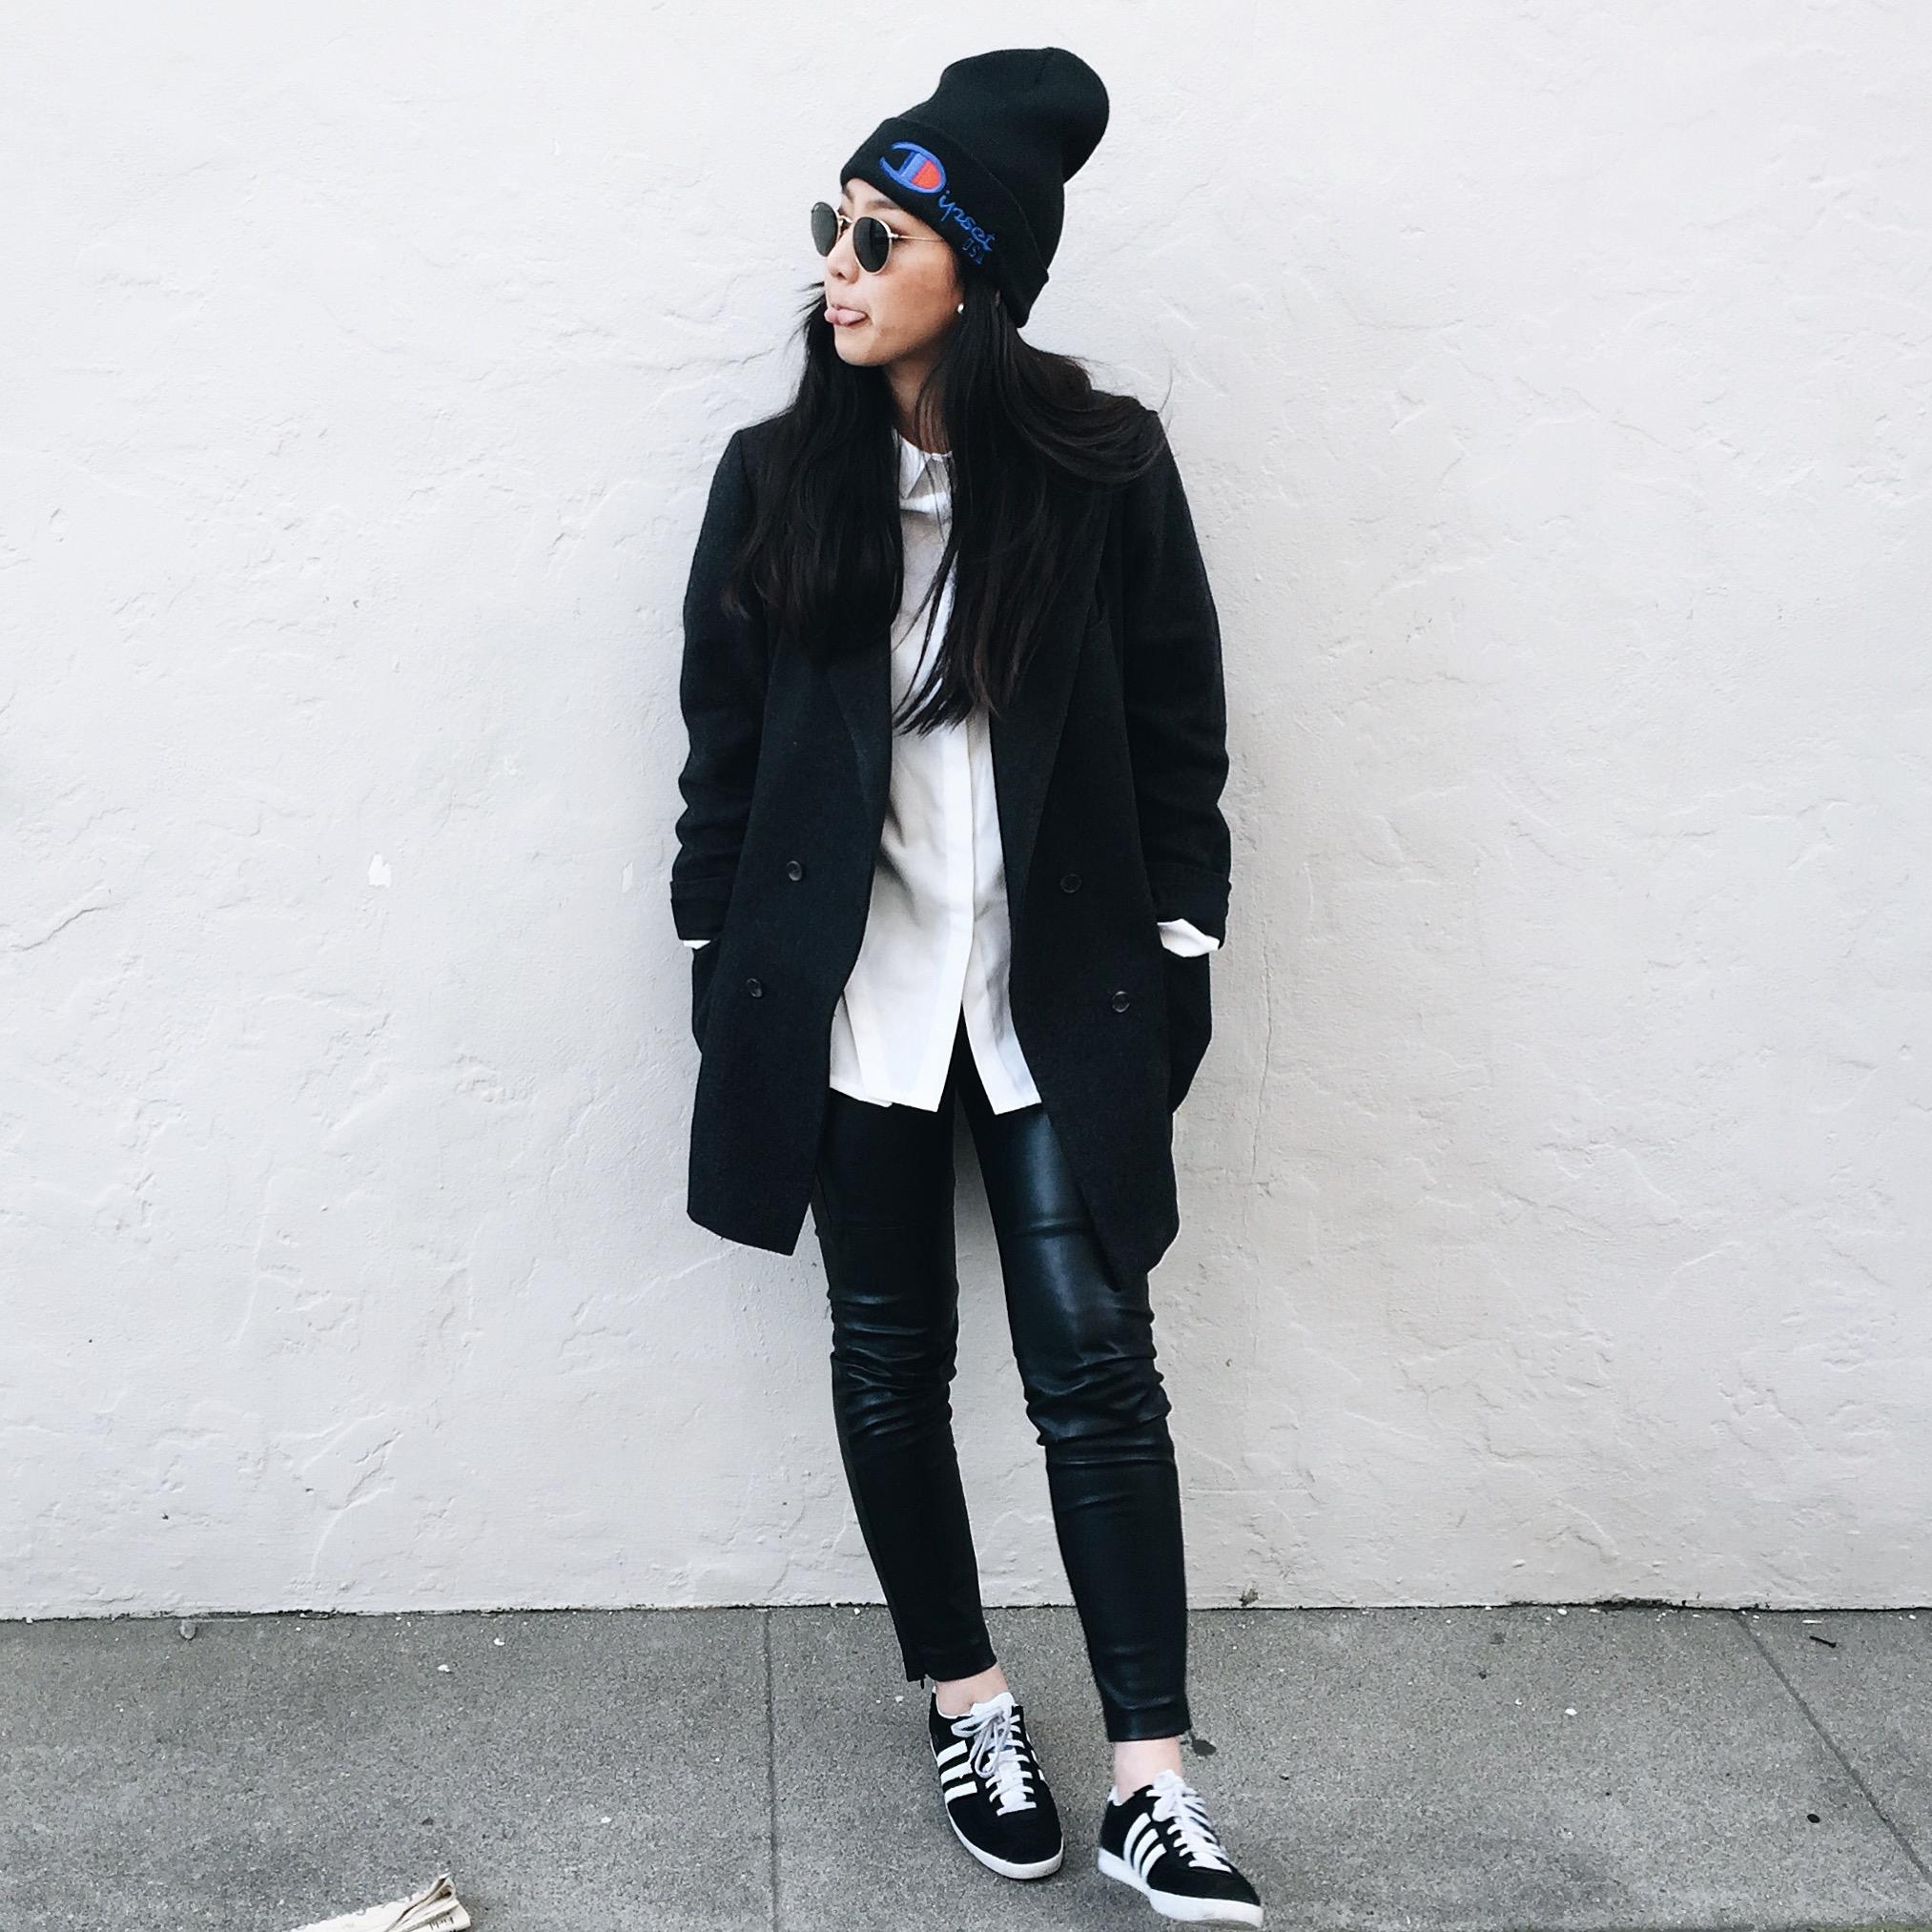 DIPSET  beanie  / PROJECT WHITE ELEPHANT   Riley shirt     / H&M   faux leather leggings   /  bespoke boyfriend blazer  / ADIDAS   Gazelle sneakers